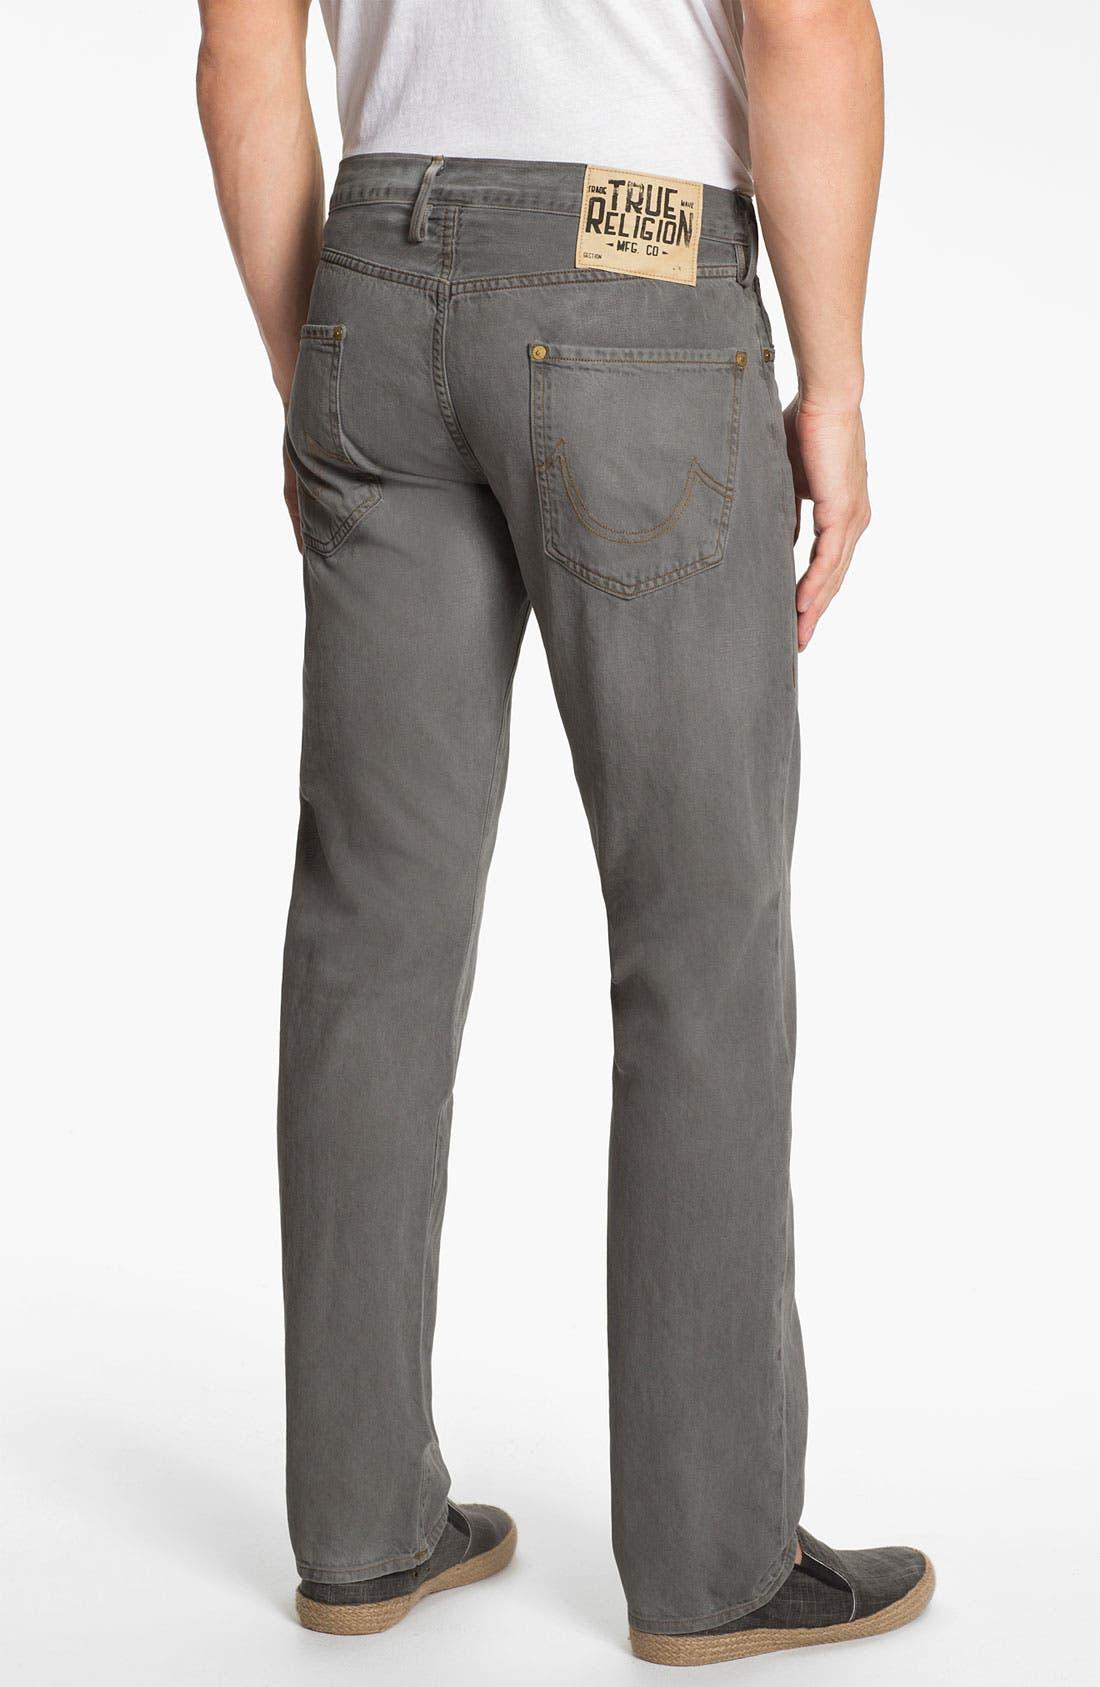 Main Image - True Religion Brand Jeans 'Geno Blue Collar Crossroads' Slim Straight Leg Jeans (Smoke Stack)